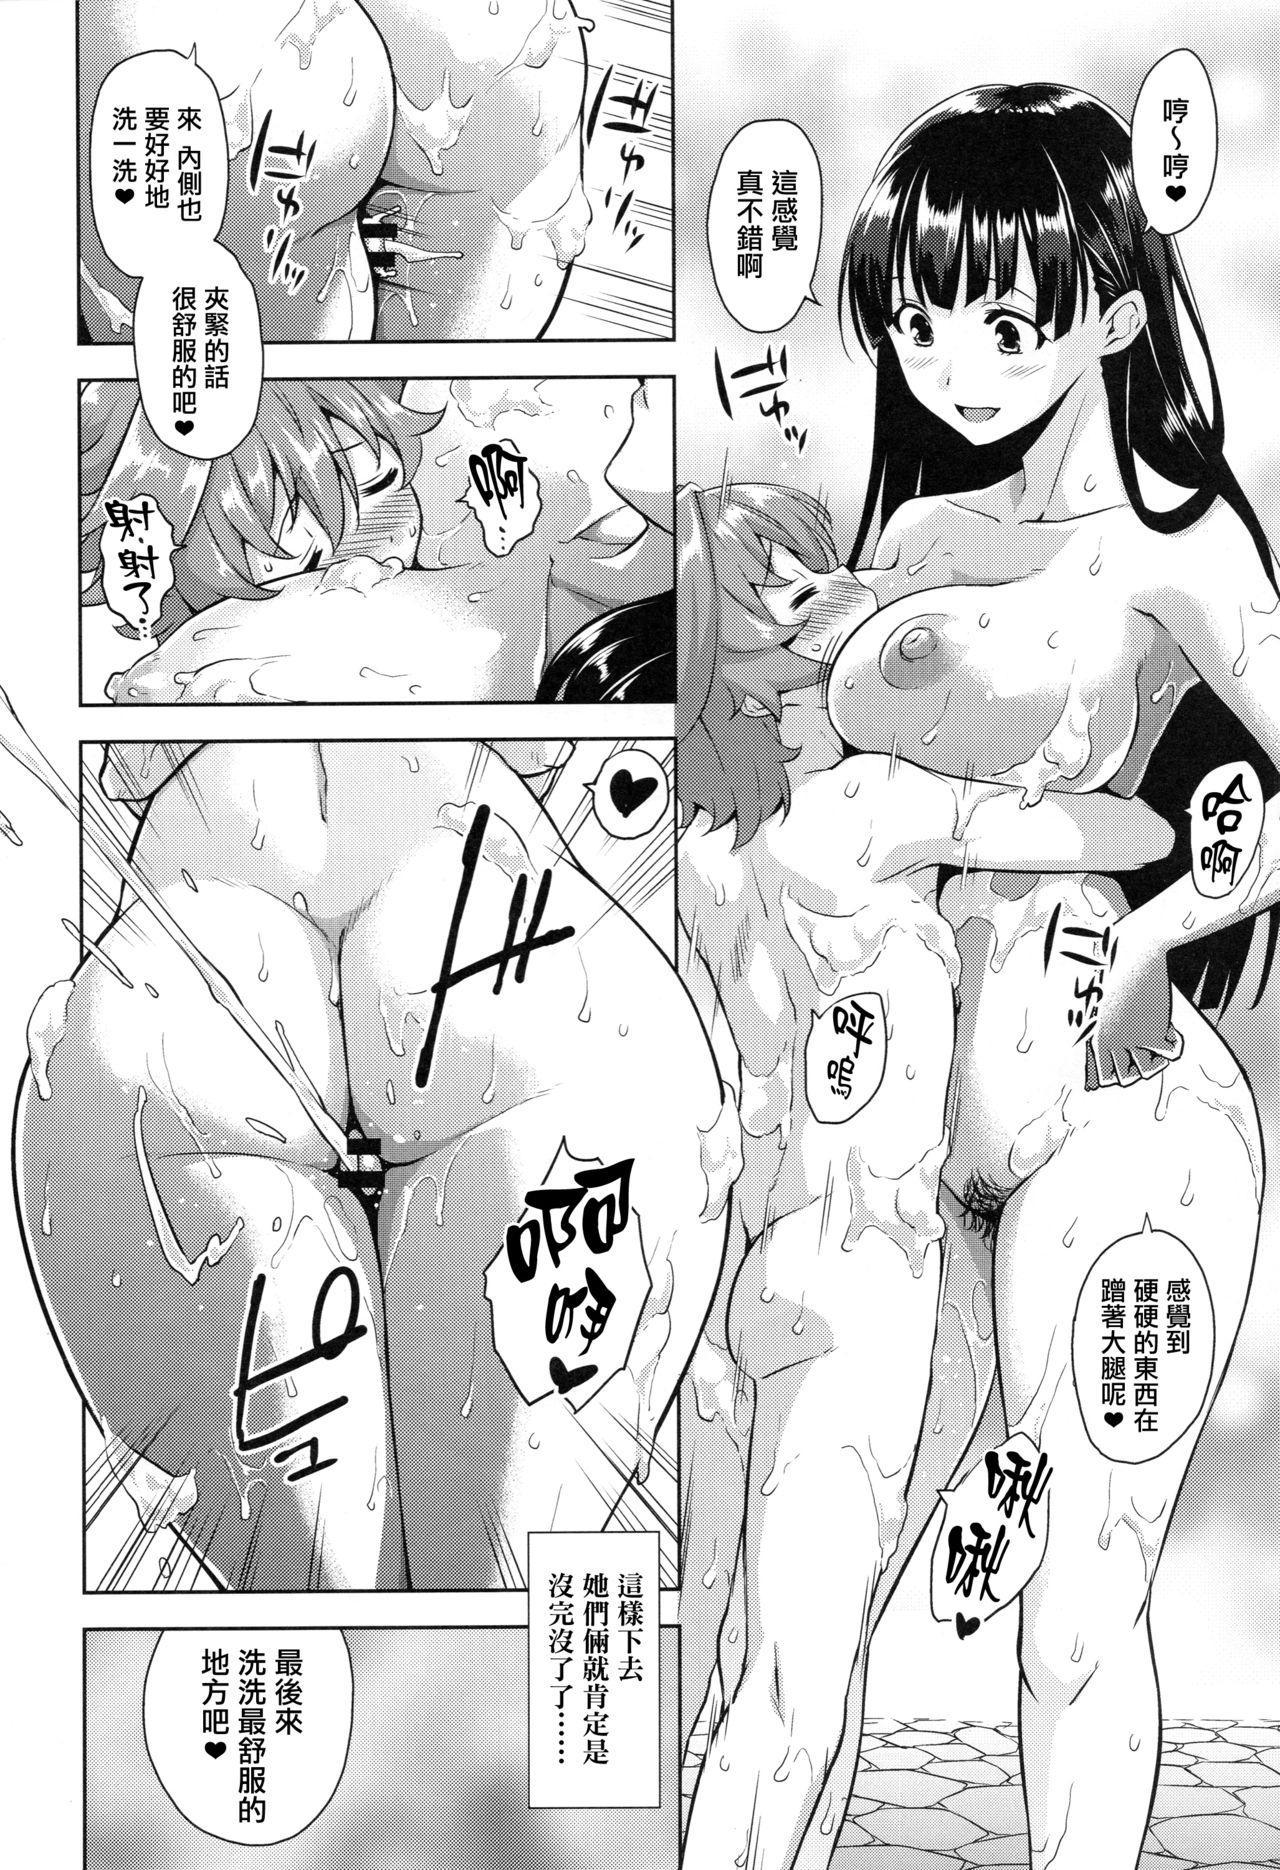 (C92) [Σ-Arts (Mikemono Yuu)] Mayoiga no Onee-san OVA-ka Kinengou Monochro Hen [Chinese] [无毒汉化组] 9